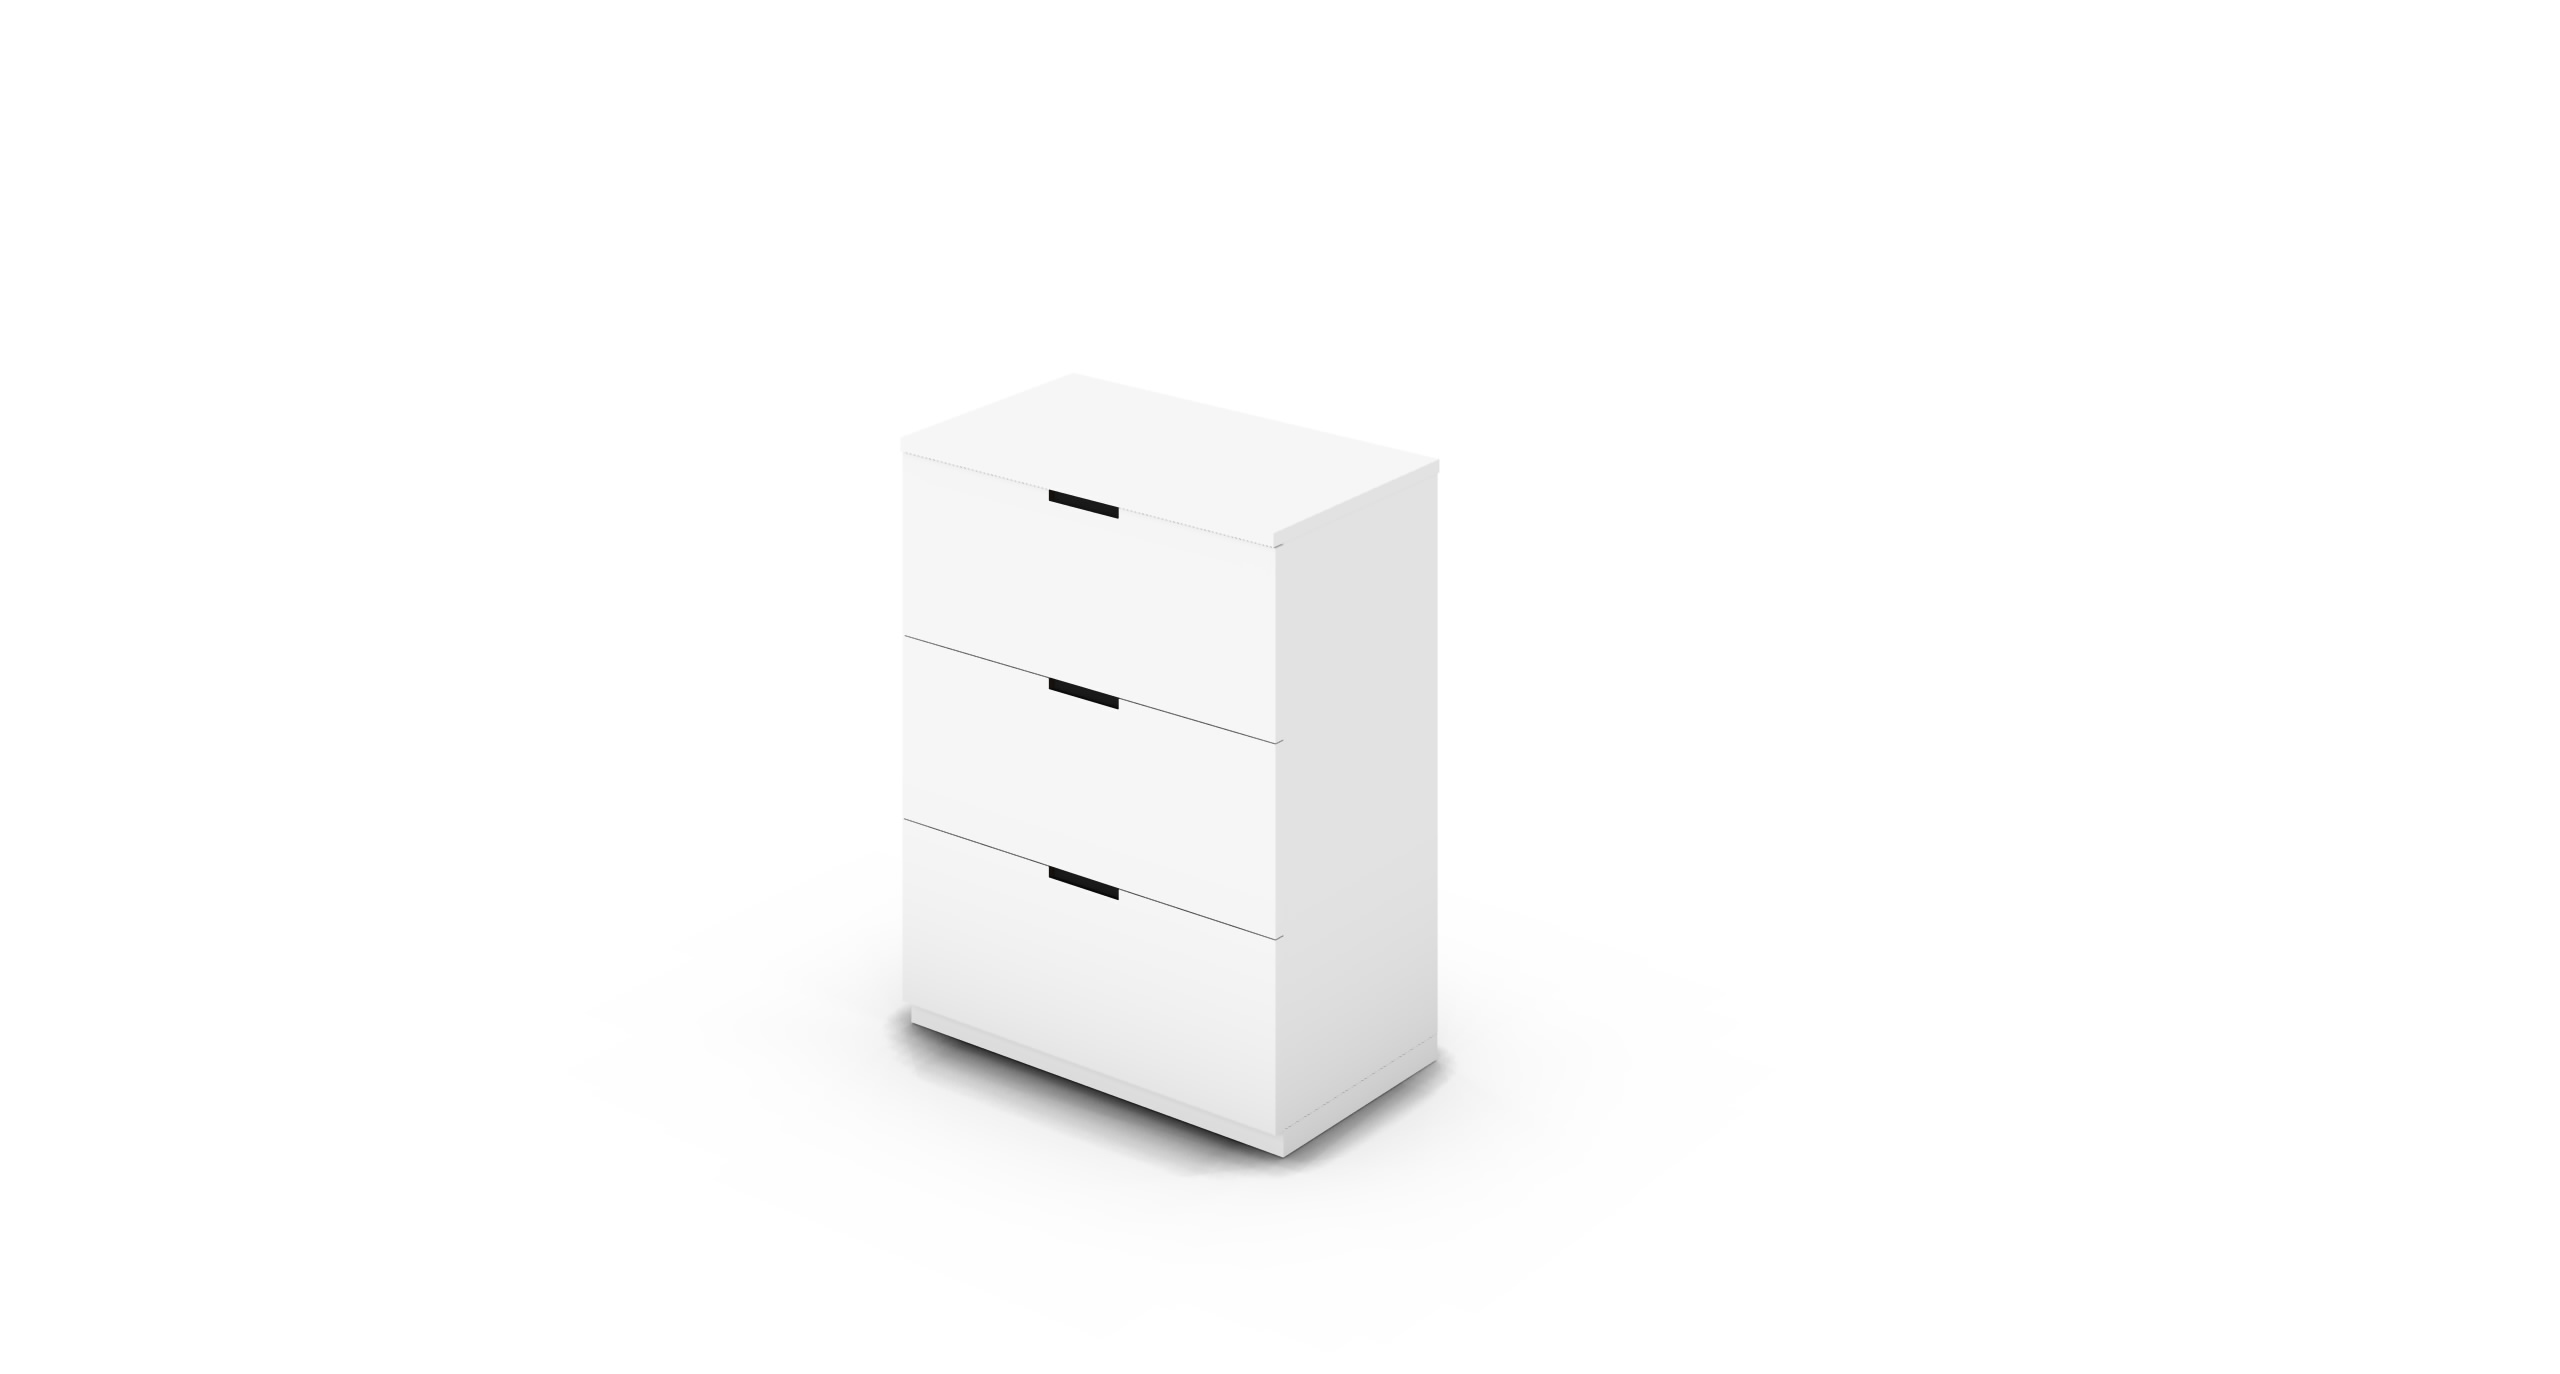 Cabinet_800x450x1125_DR_White_CutOut_NoCylinder